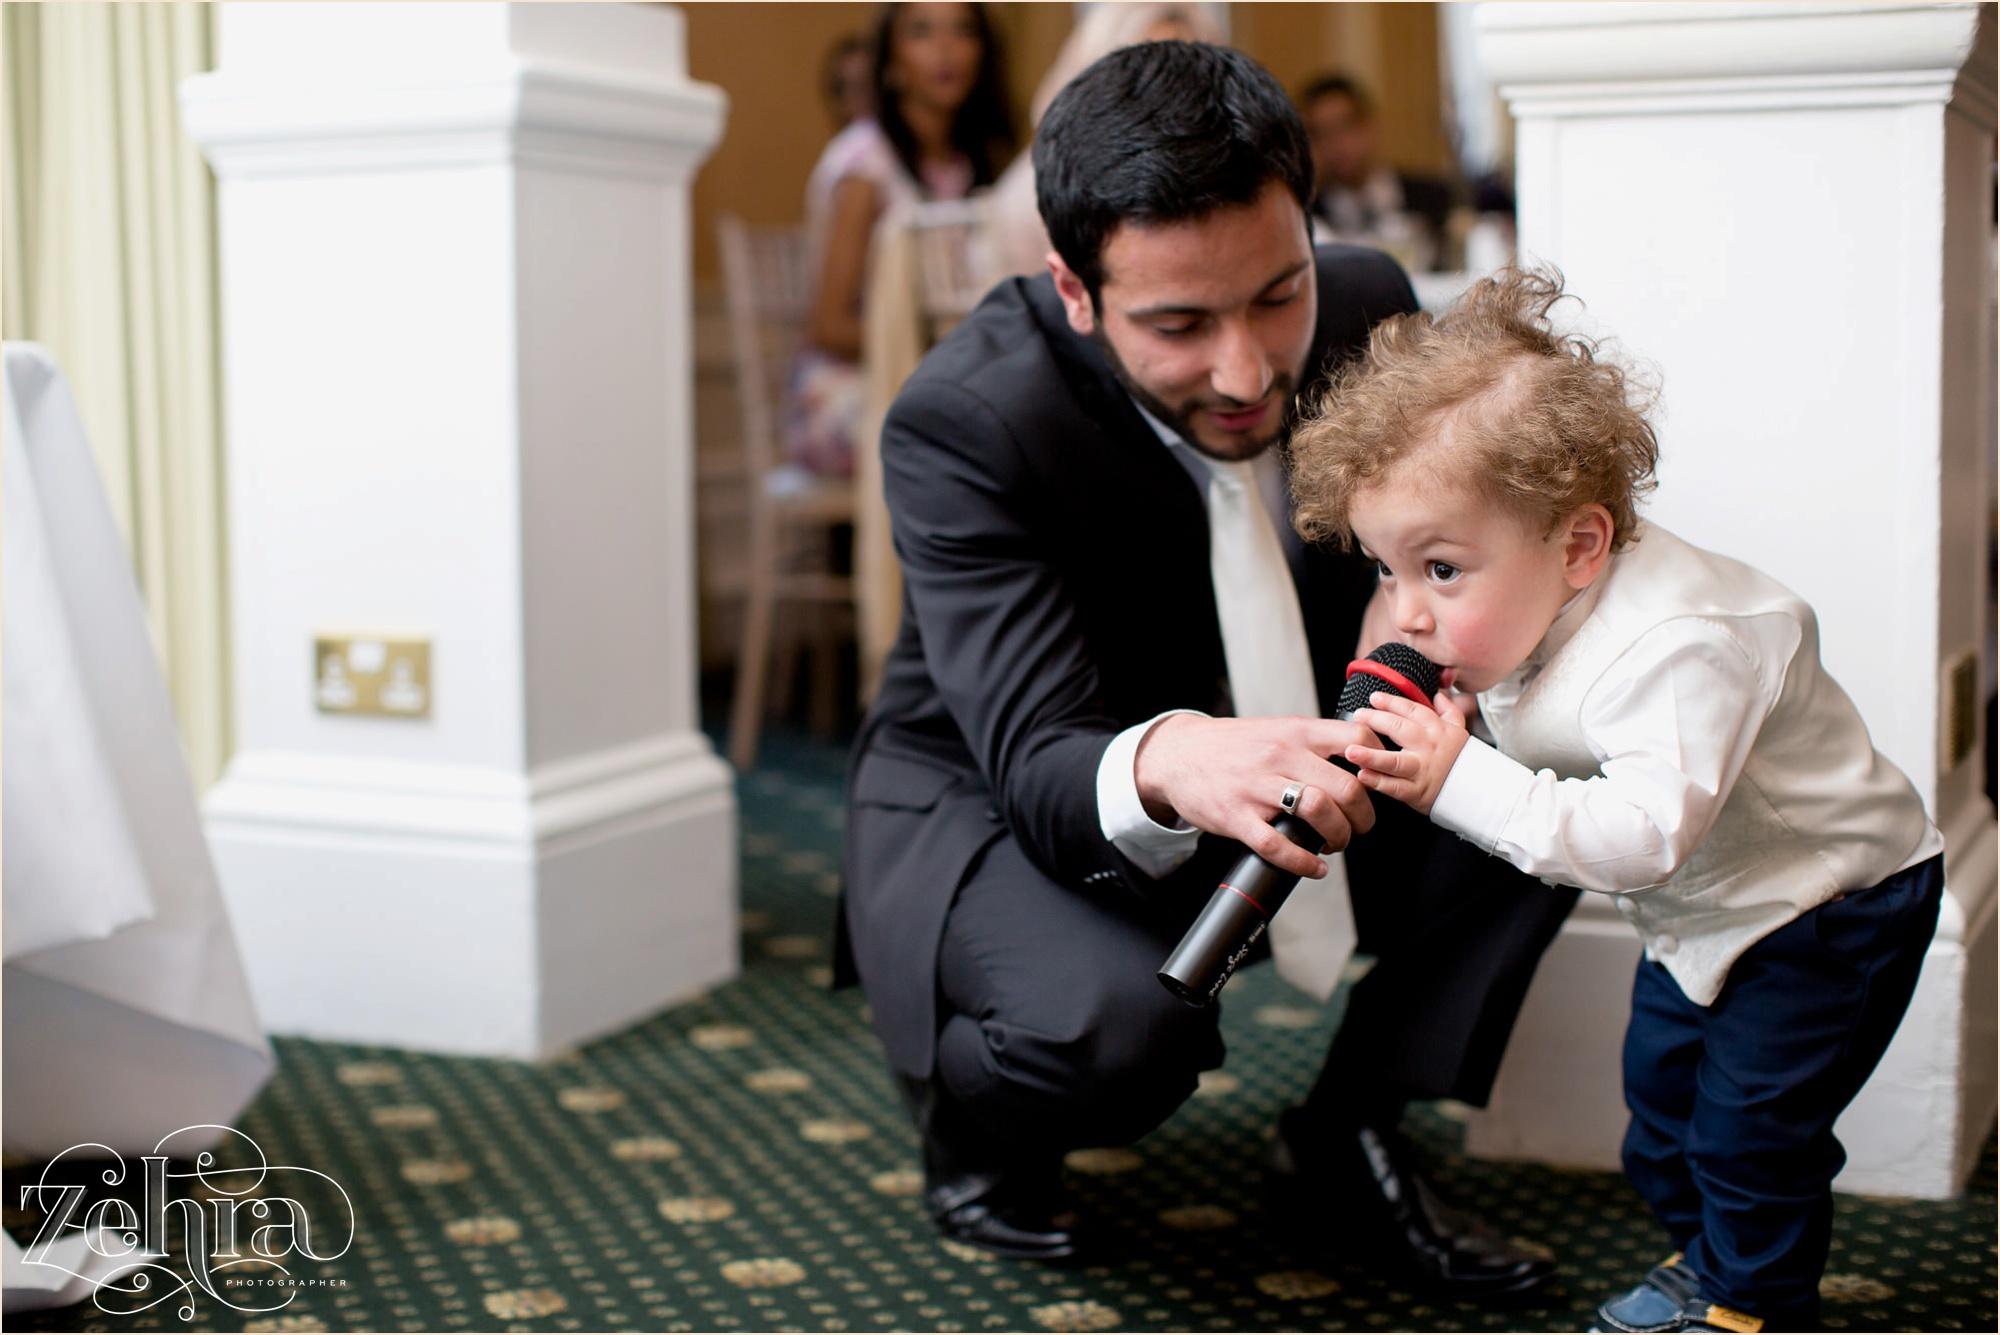 jasira manchester wedding photographer_0113.jpg